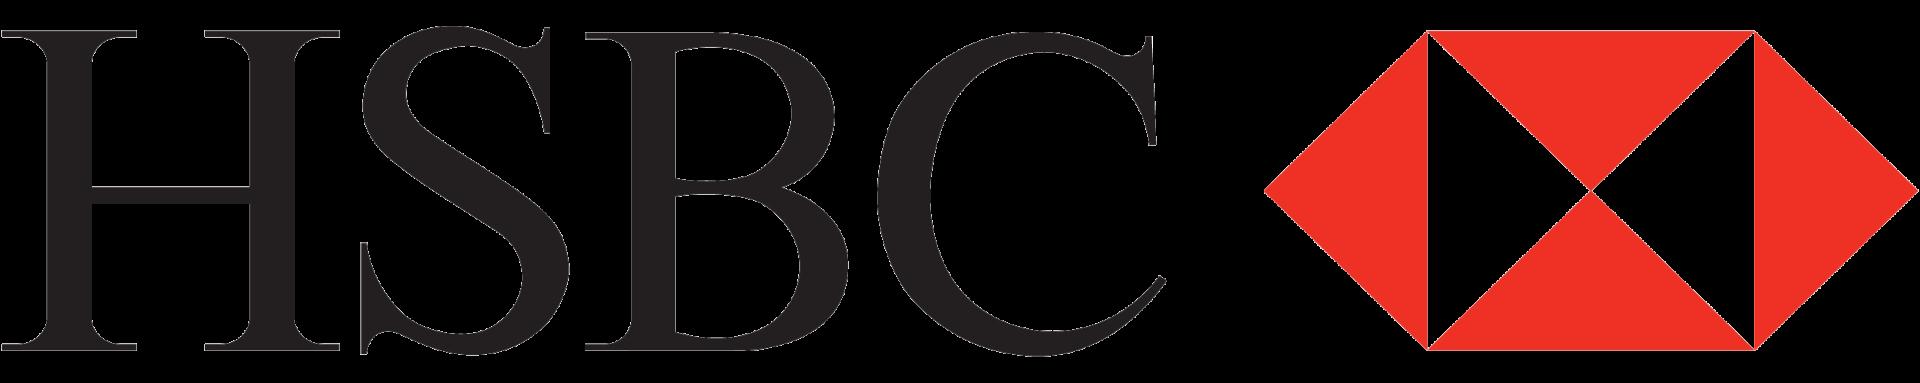 HSBC-Logo-w1920.png